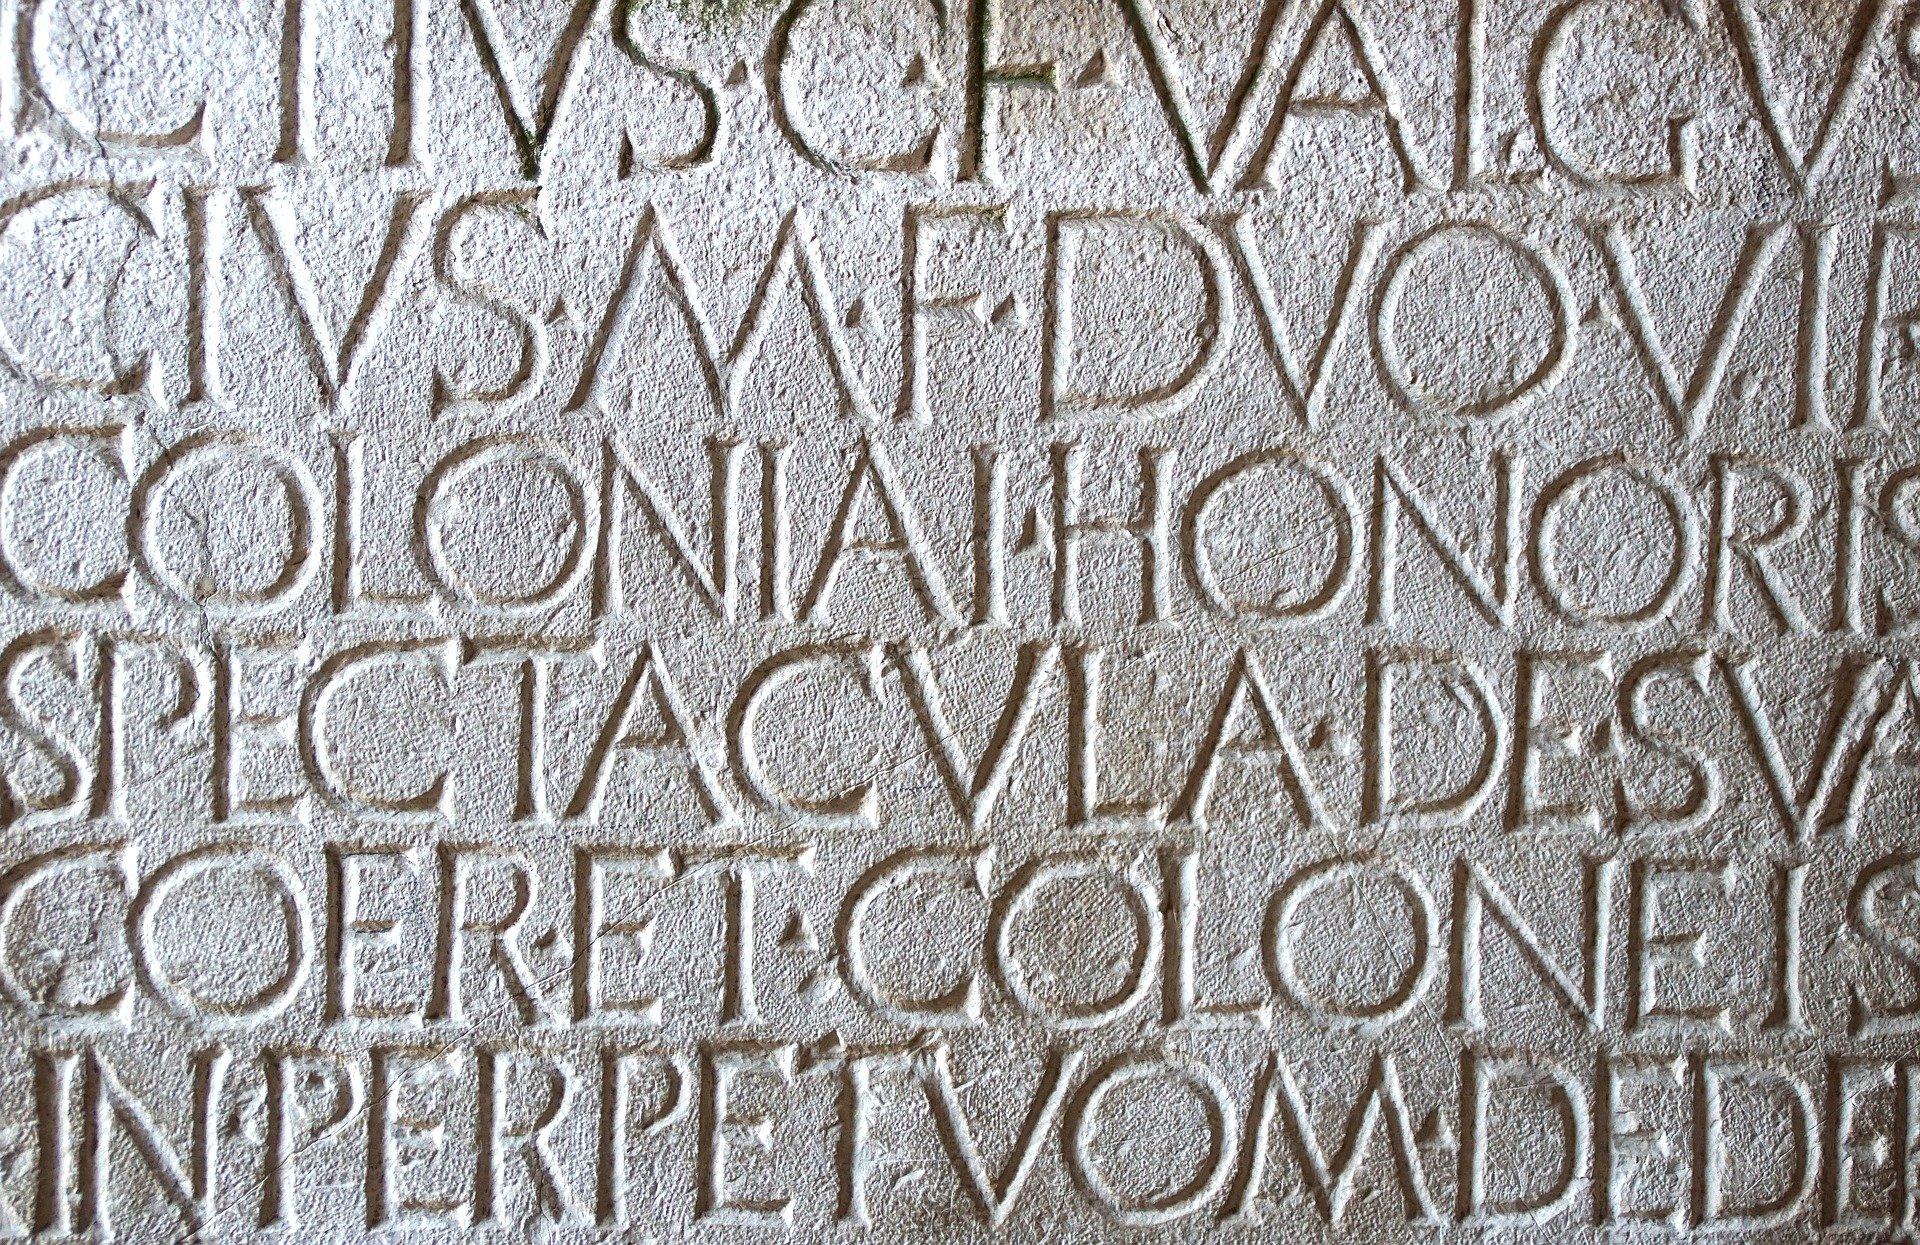 pompeii-3677352_1920